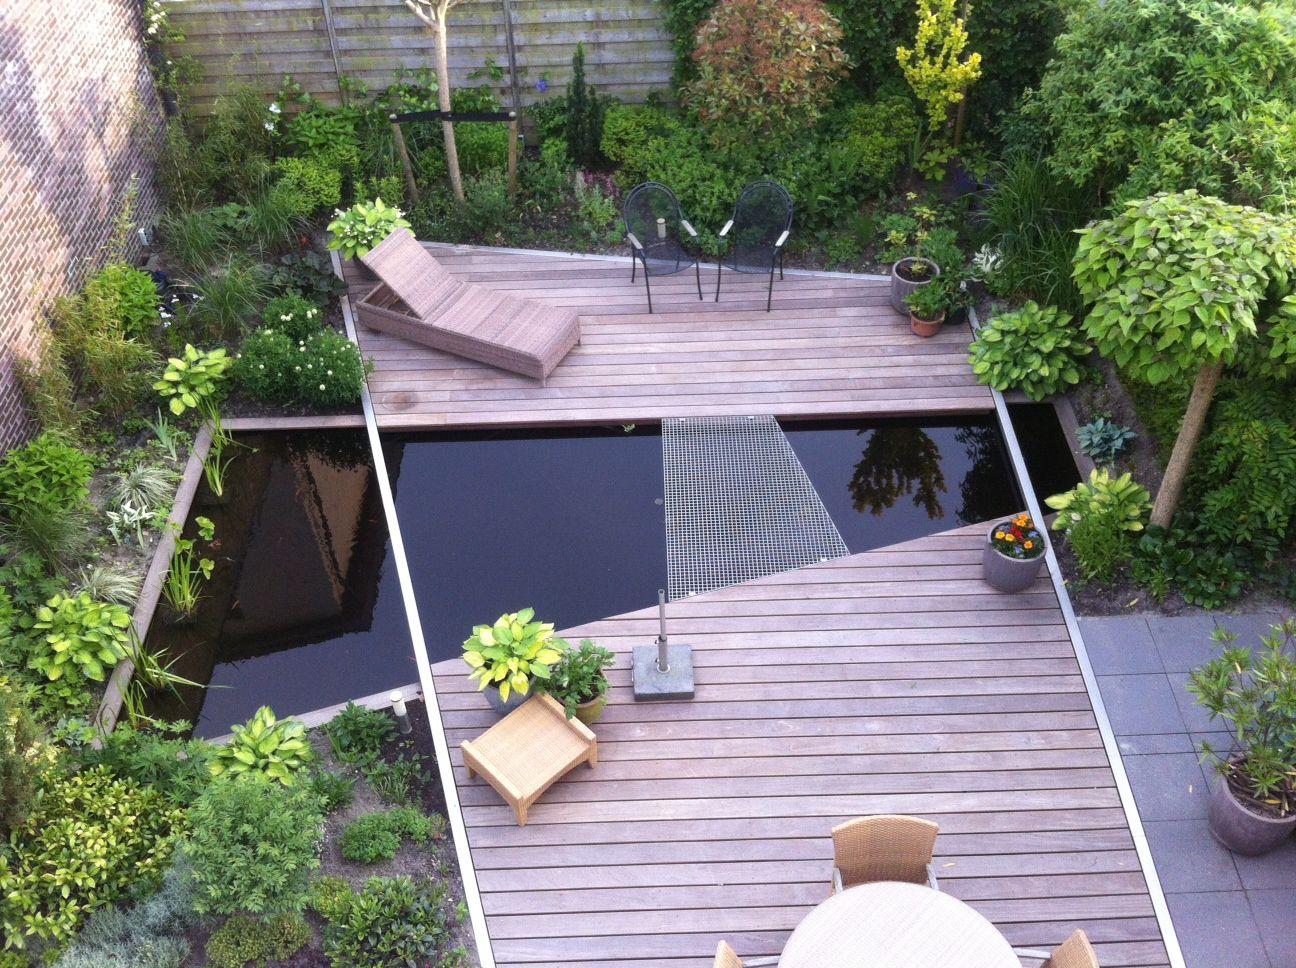 Mooi lijnenspel van de lindeloof tuinarchitect design for Tuinarchitect kleine tuin